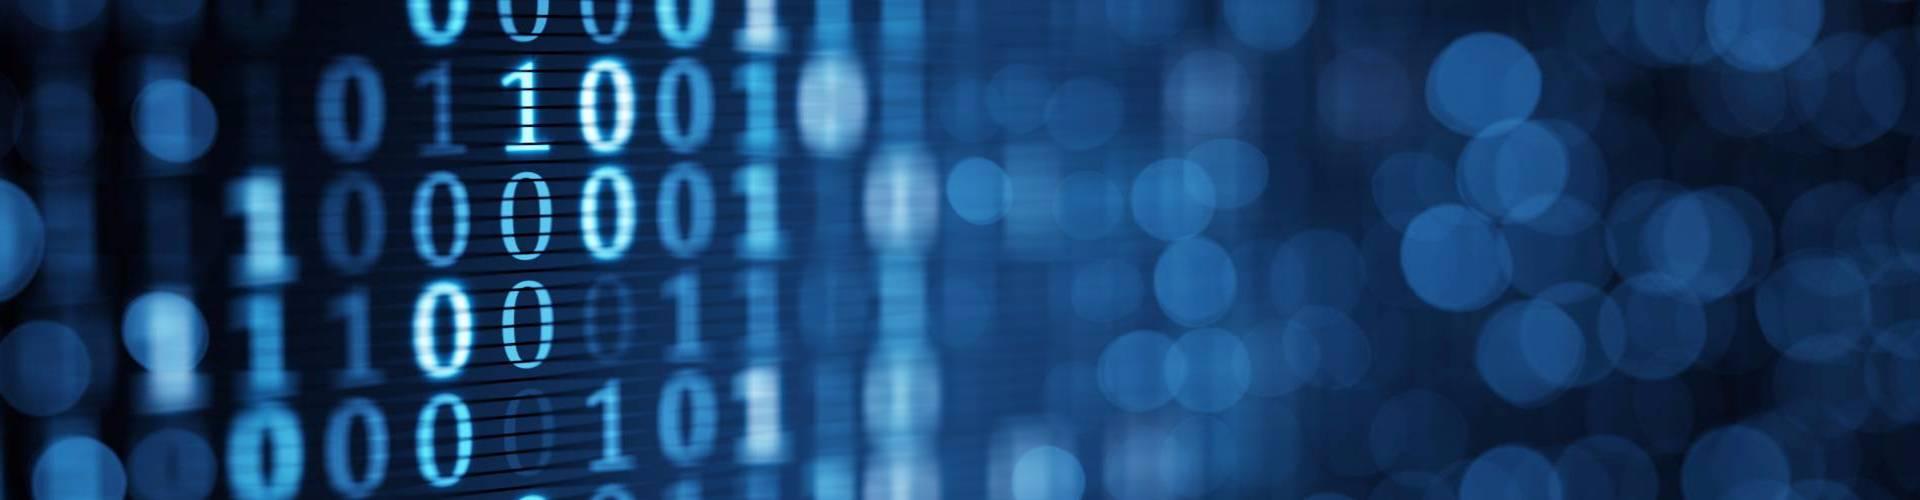 Mirai, BrickerBot, Hajime Attack a Common IoT Weakness